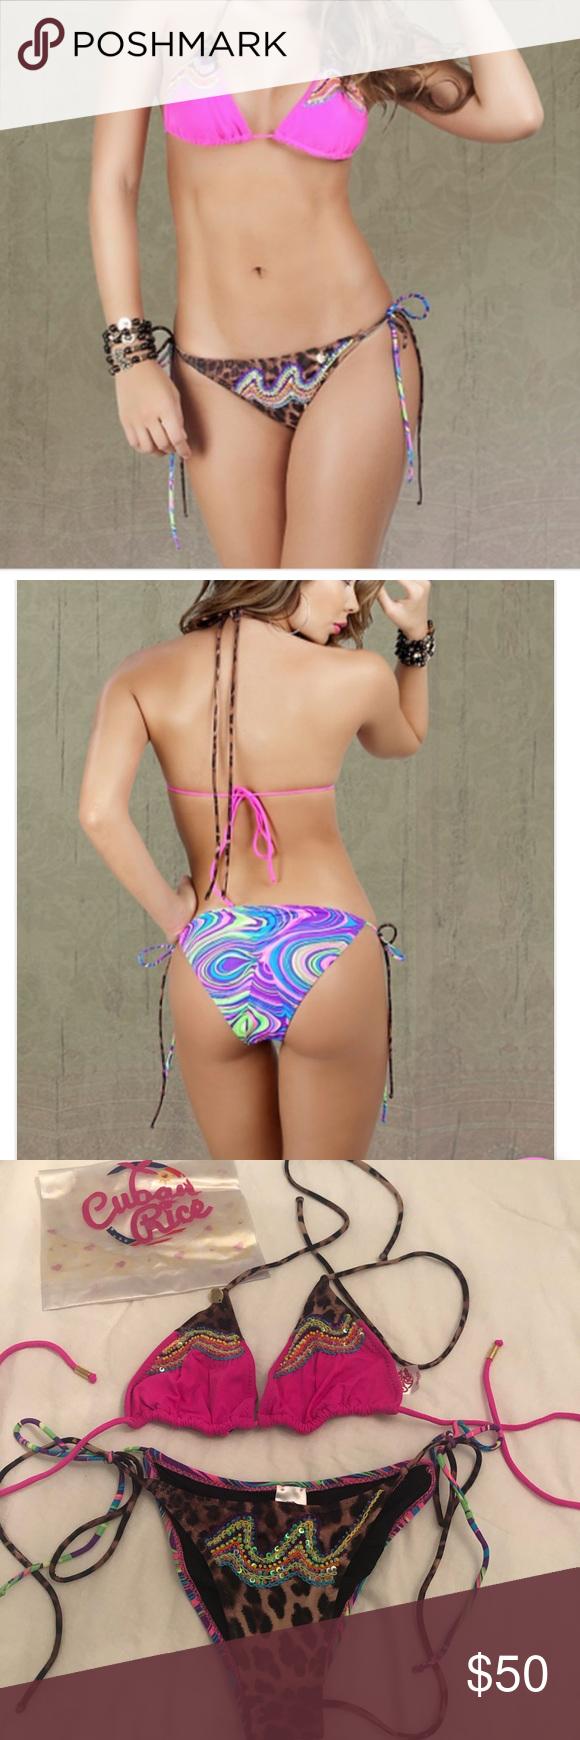 Cuban Rice Bikini - XS NWOT Cuban Rice Bikini - XS-NWOT Beautiful bikini and fabric and fit Never worn Cuban Rice Swim Bikinis #cubanrice Cuban Rice Bikini - XS NWOT Cuban Rice Bikini - XS-NWOT Beautiful bikini and fabric and fit Never worn Cuban Rice Swim Bikinis #cubanrice